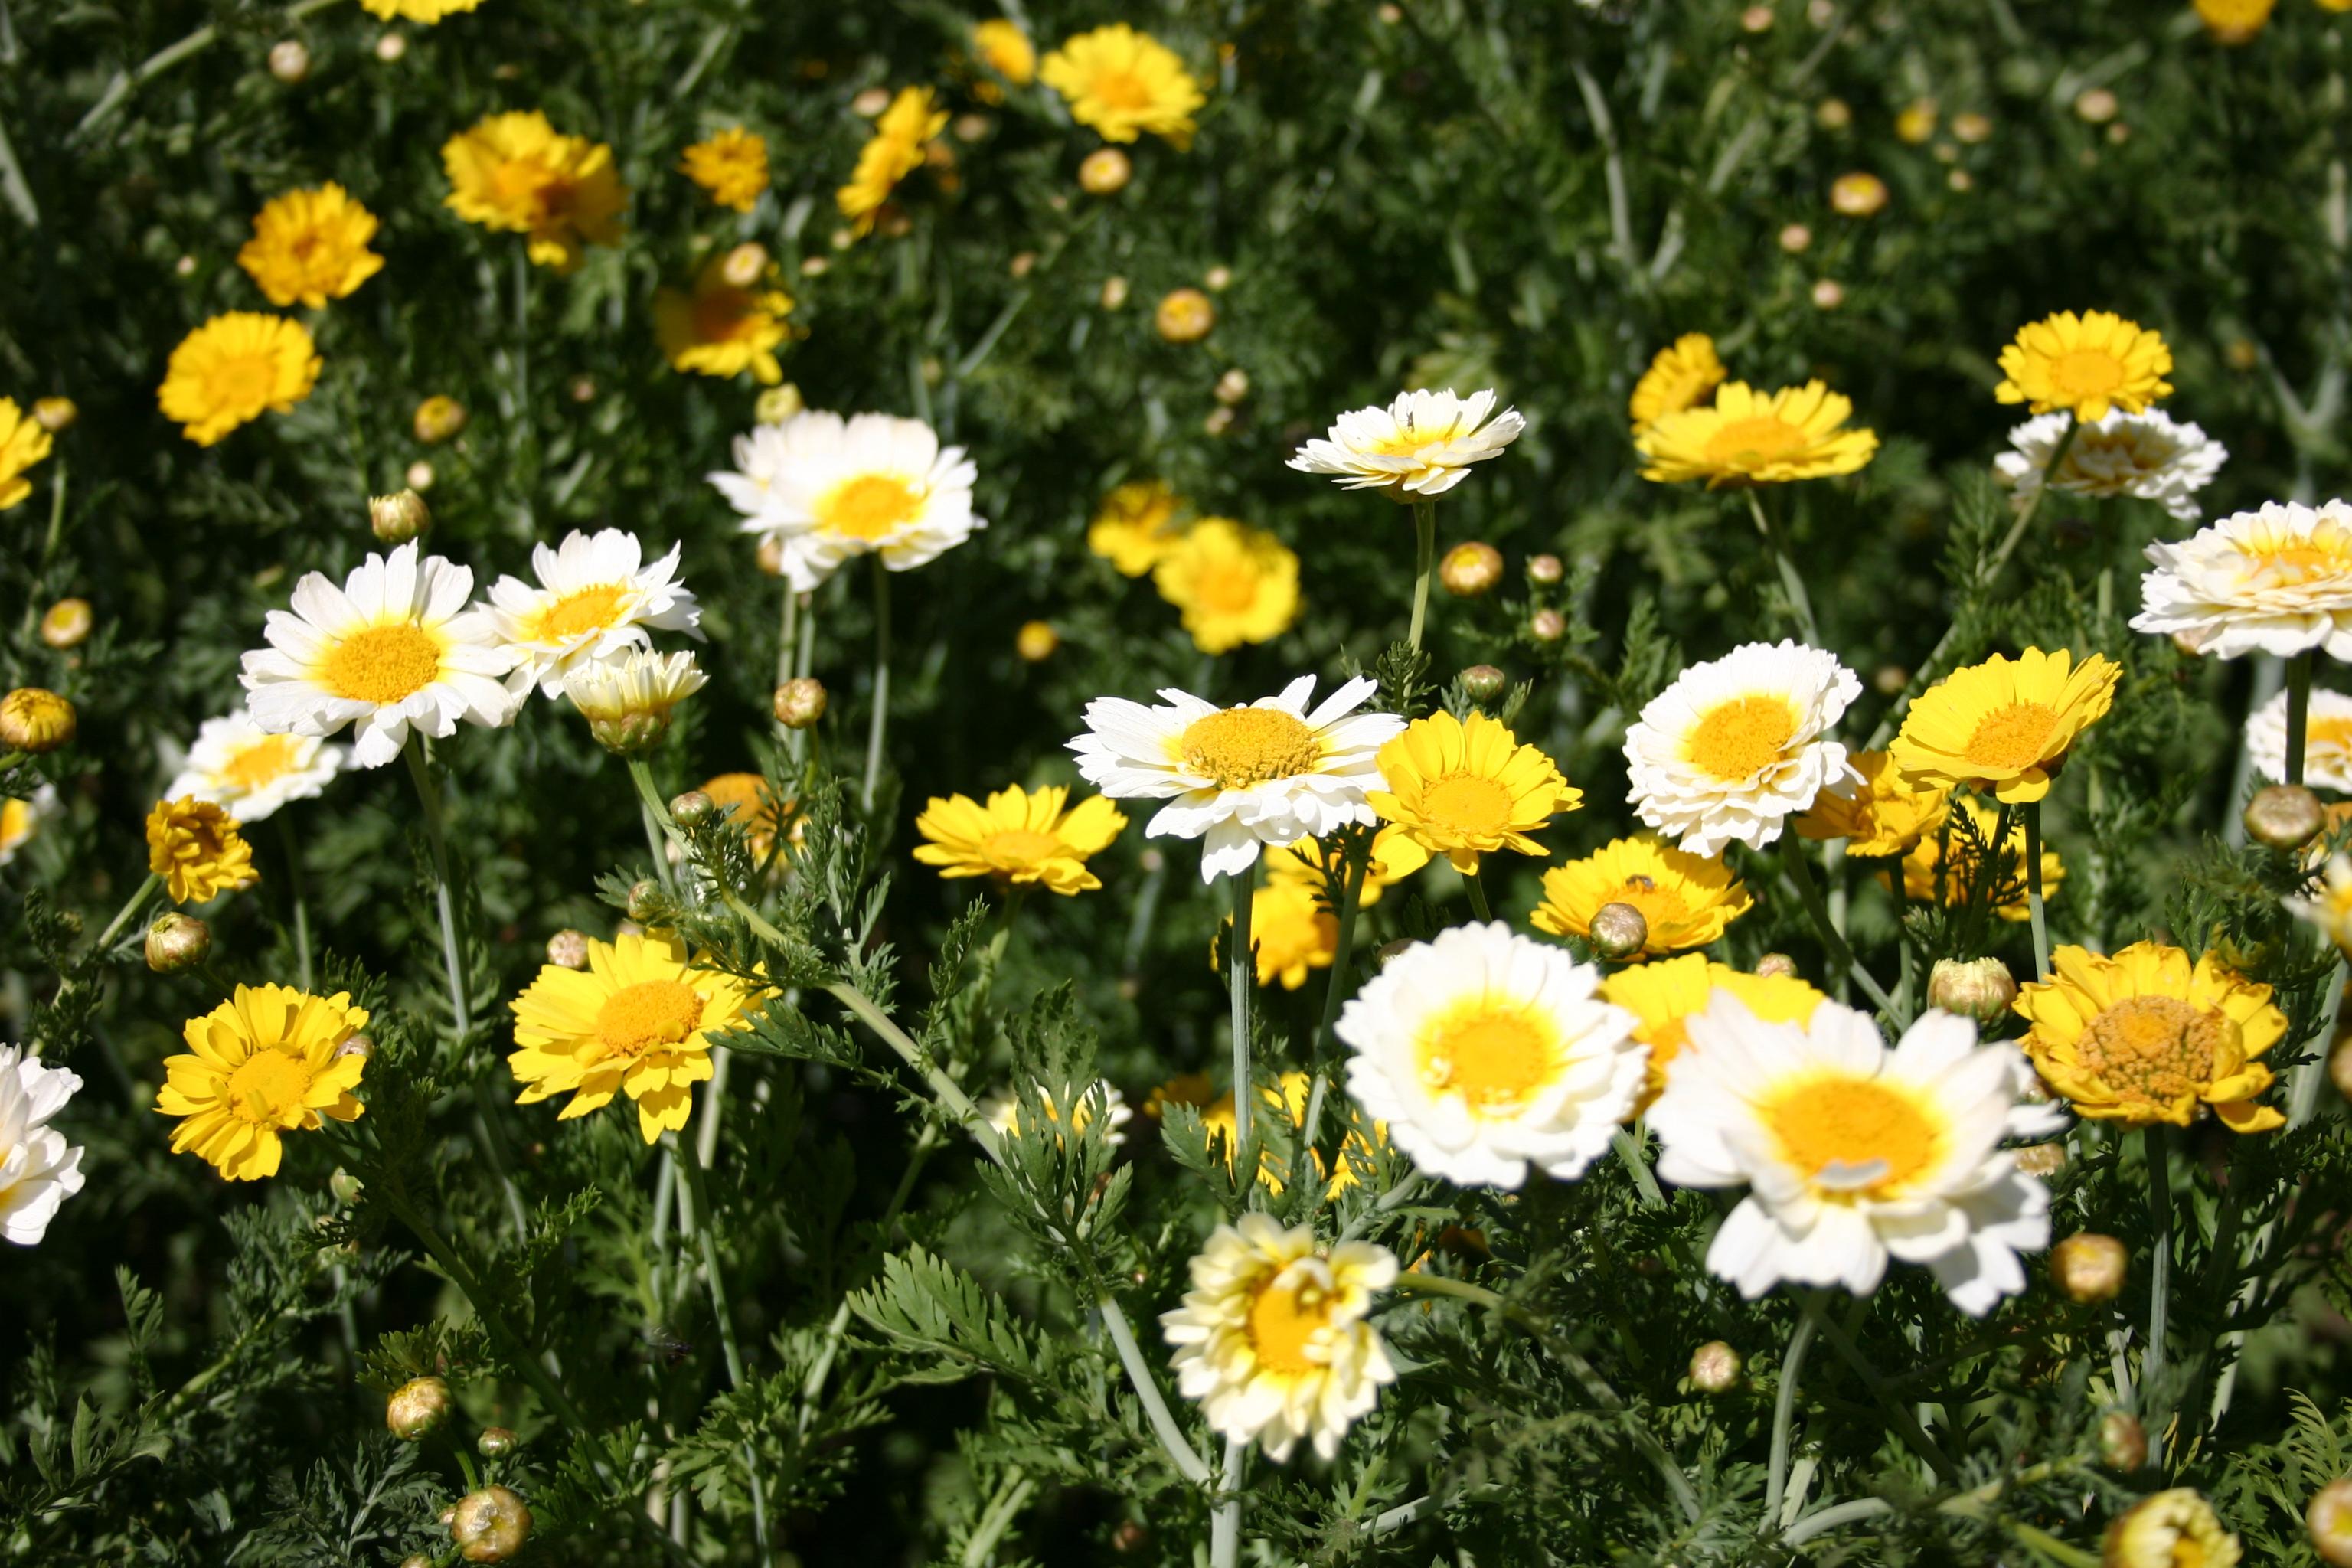 Daisy Garland Mix Oregon Wholesale Seed Company